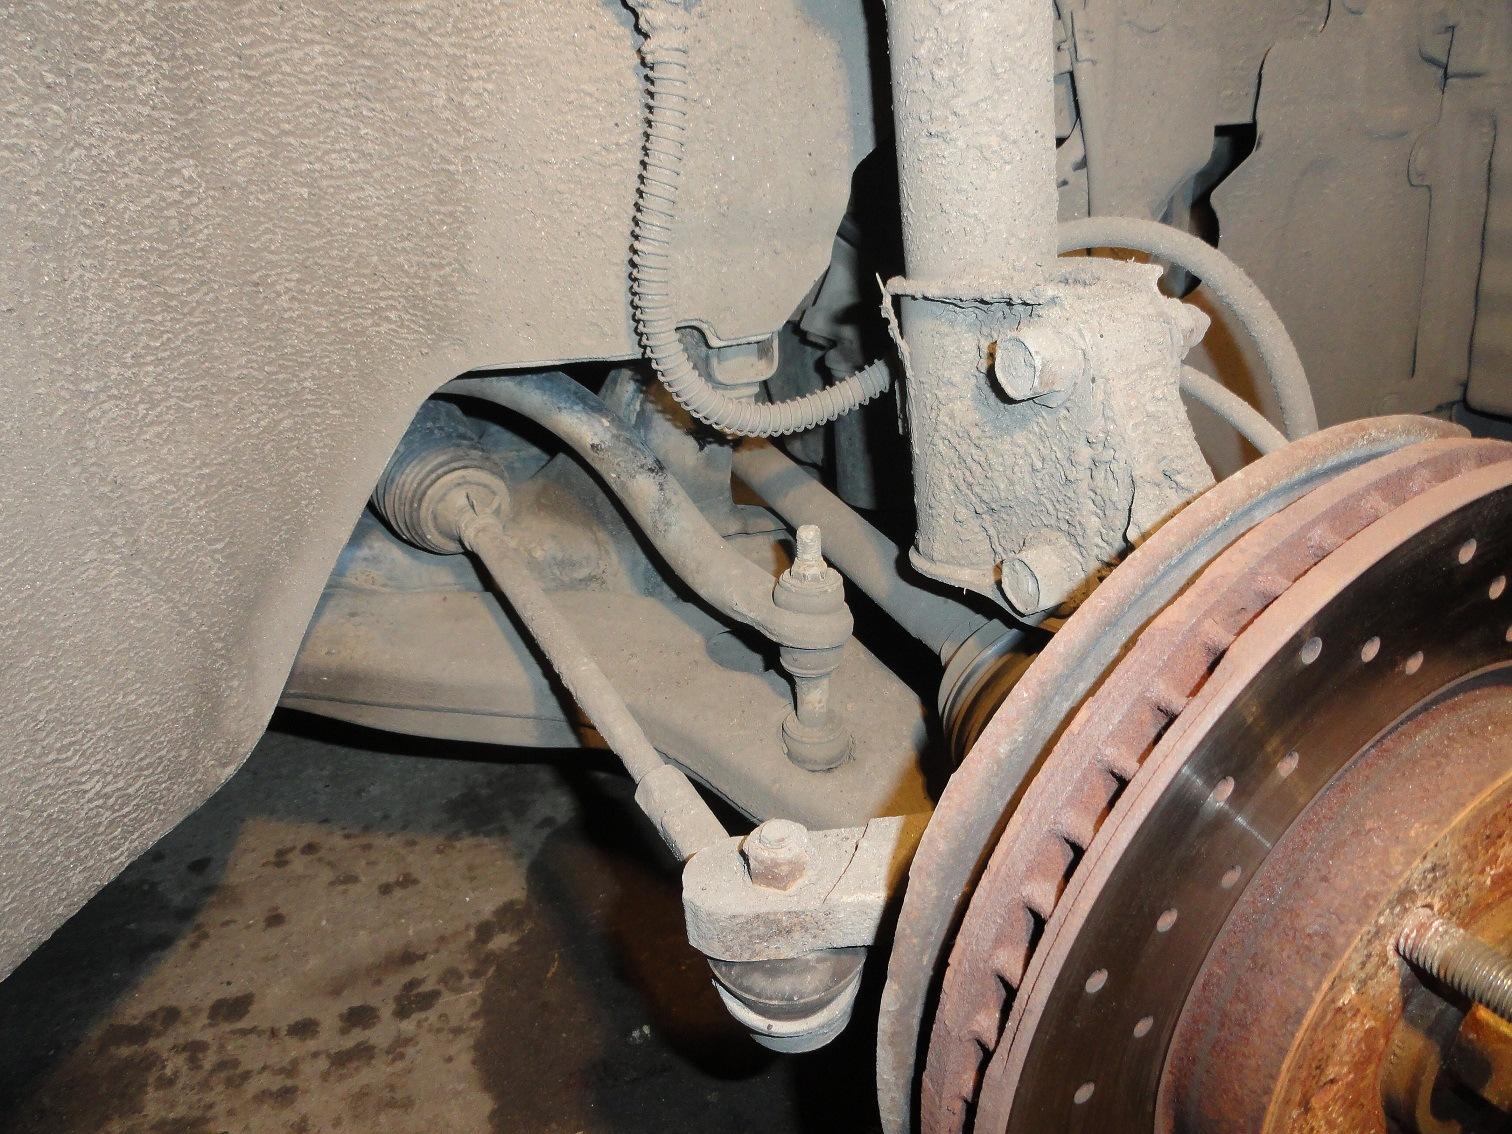 Замена втулки стабилизатора мицубиси лансер 10 Замена заднего сальника марк 2